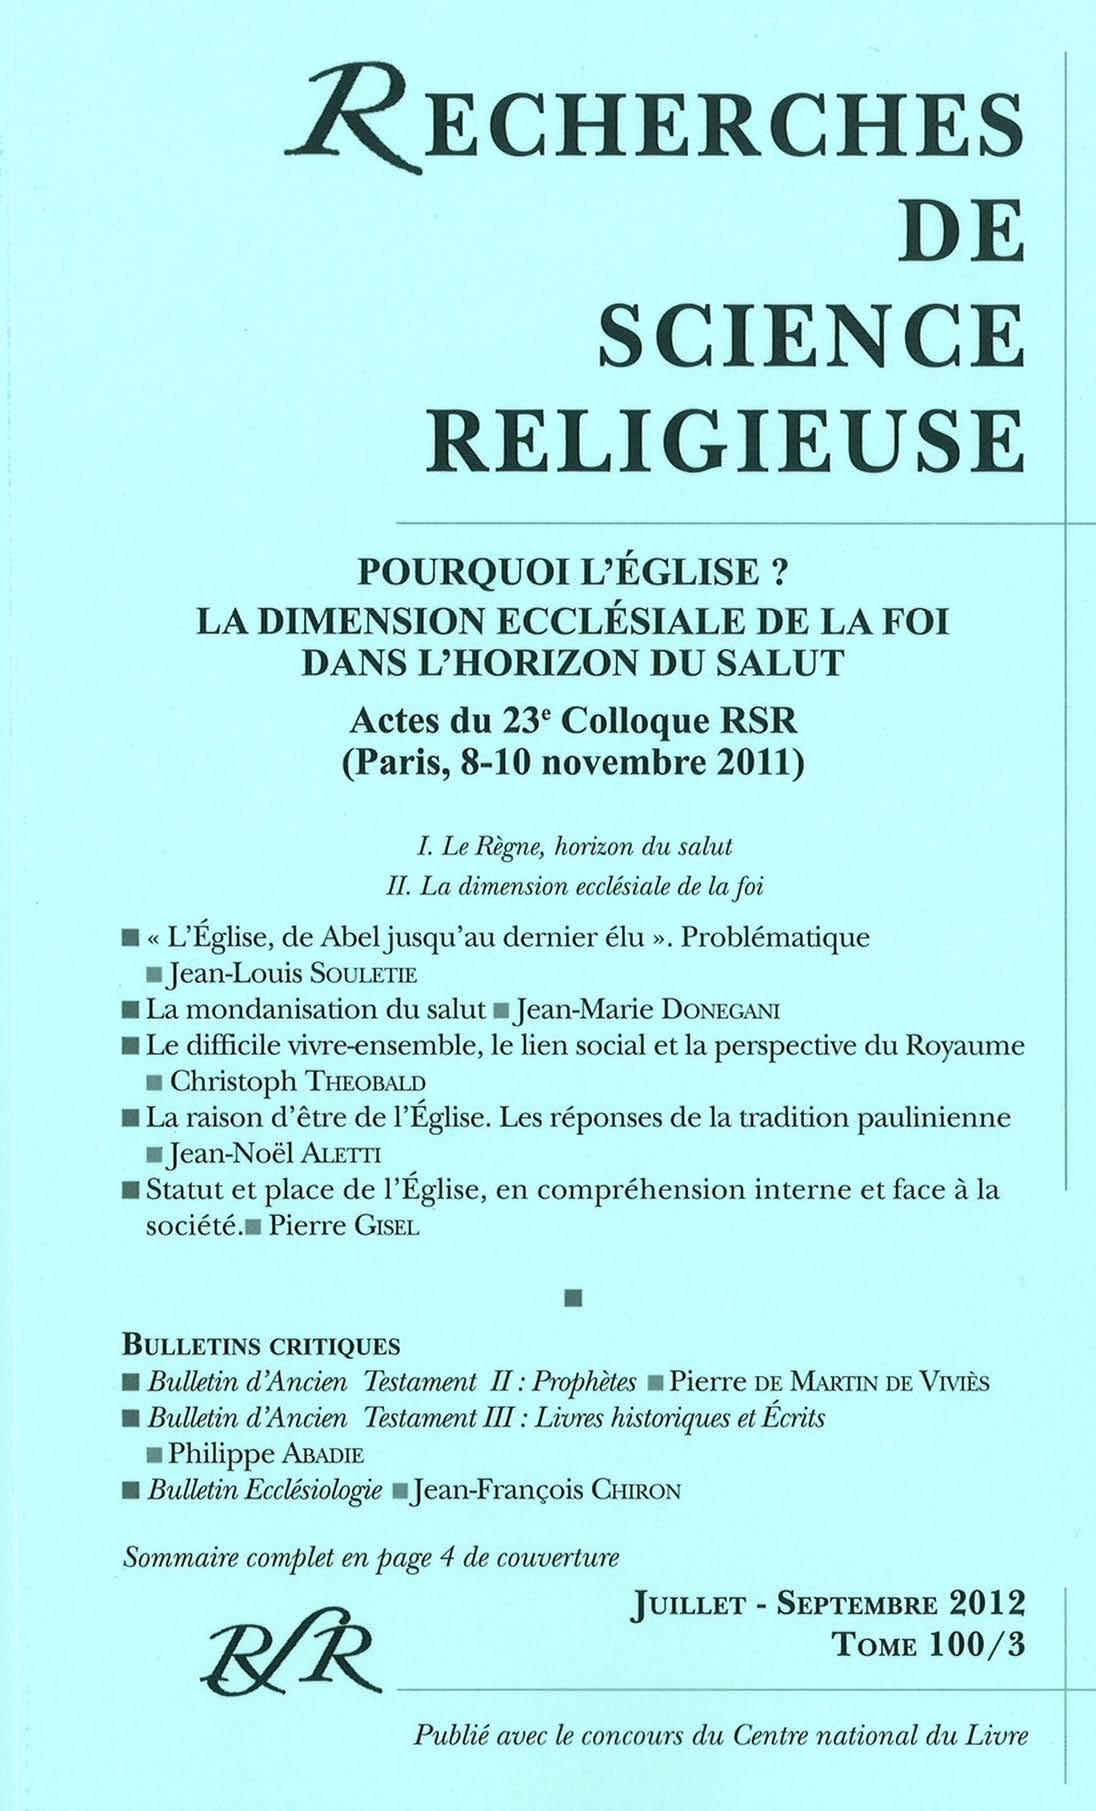 Bulletin D Ancien Testament Ii Prophetes Cairn Info